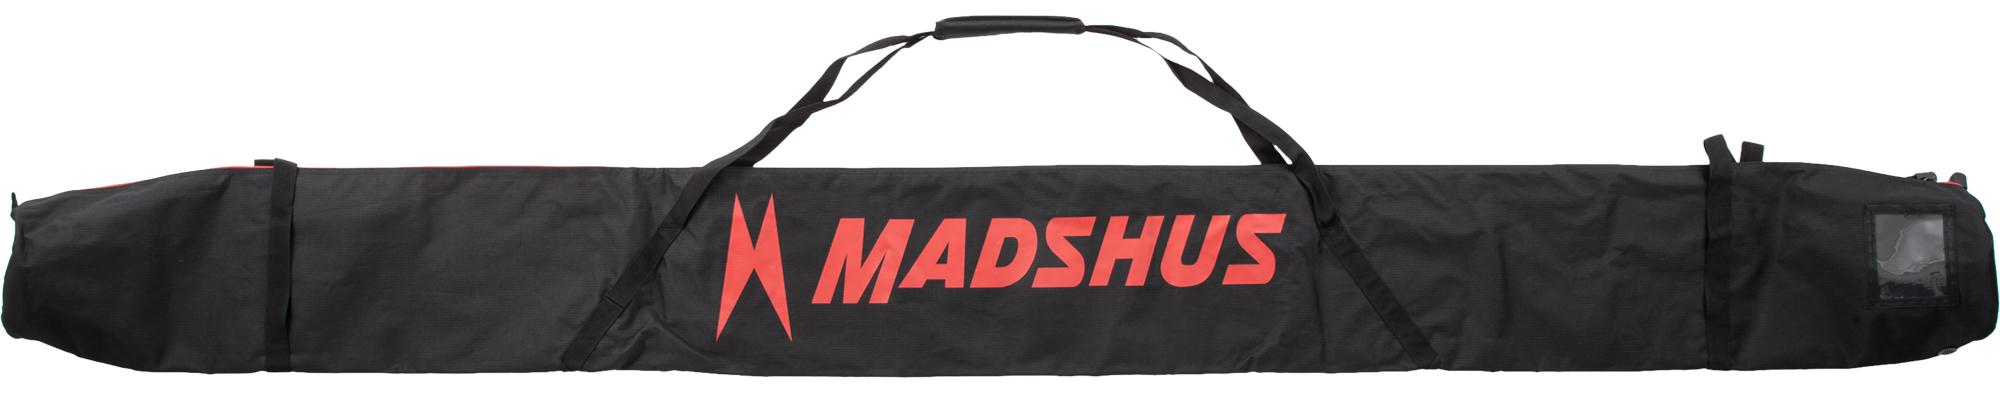 Madshus Чехол для беговых лыж 210 см, 1 пара